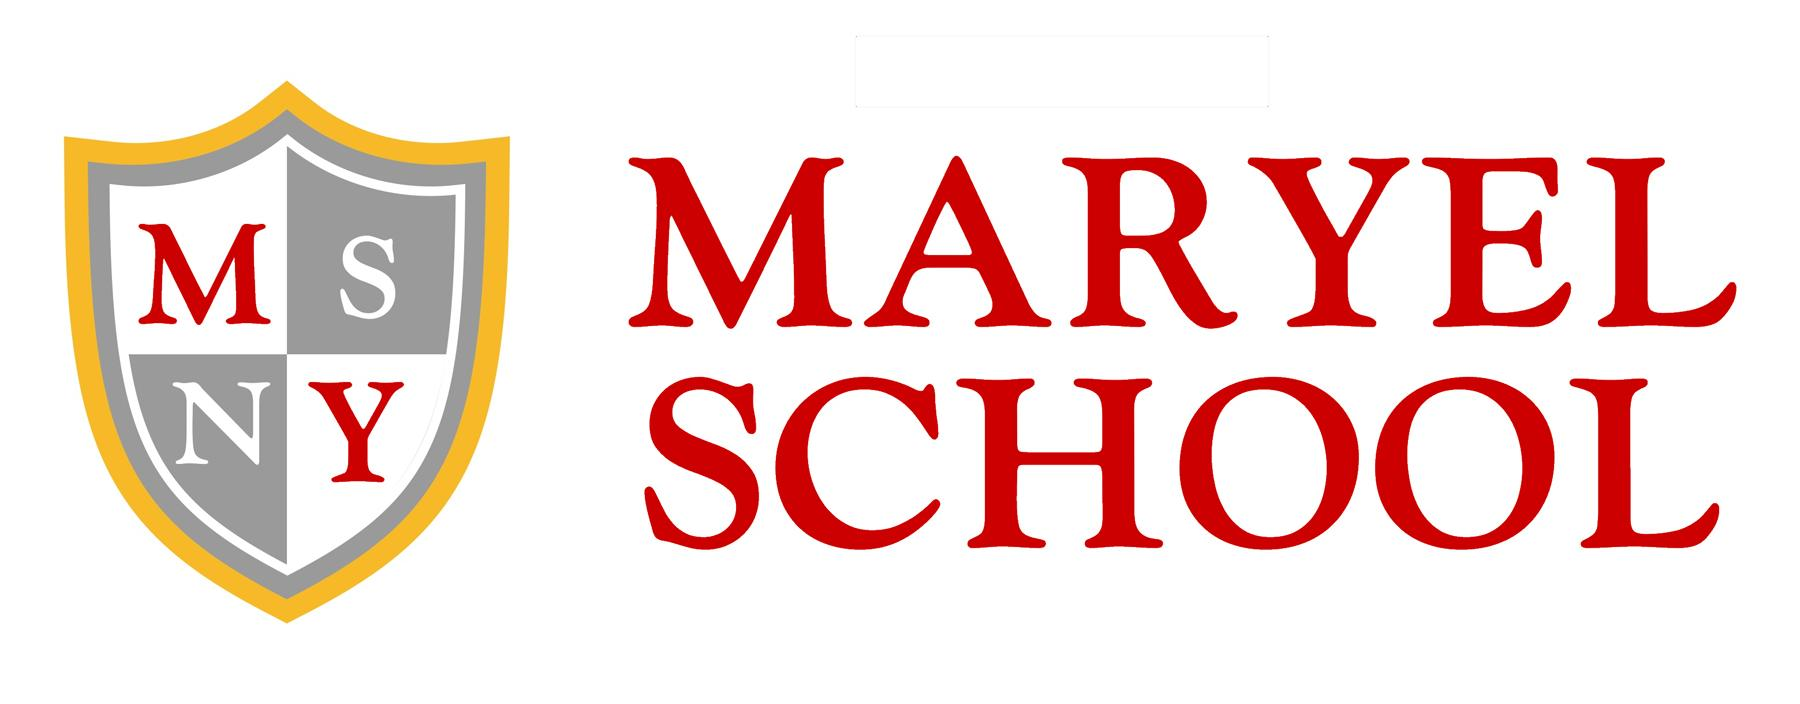 Maryel School of New York - school  | Photo 9 of 10 | Address: 28 E 35th St, New York, NY 10016, USA | Phone: (212) 213-2097